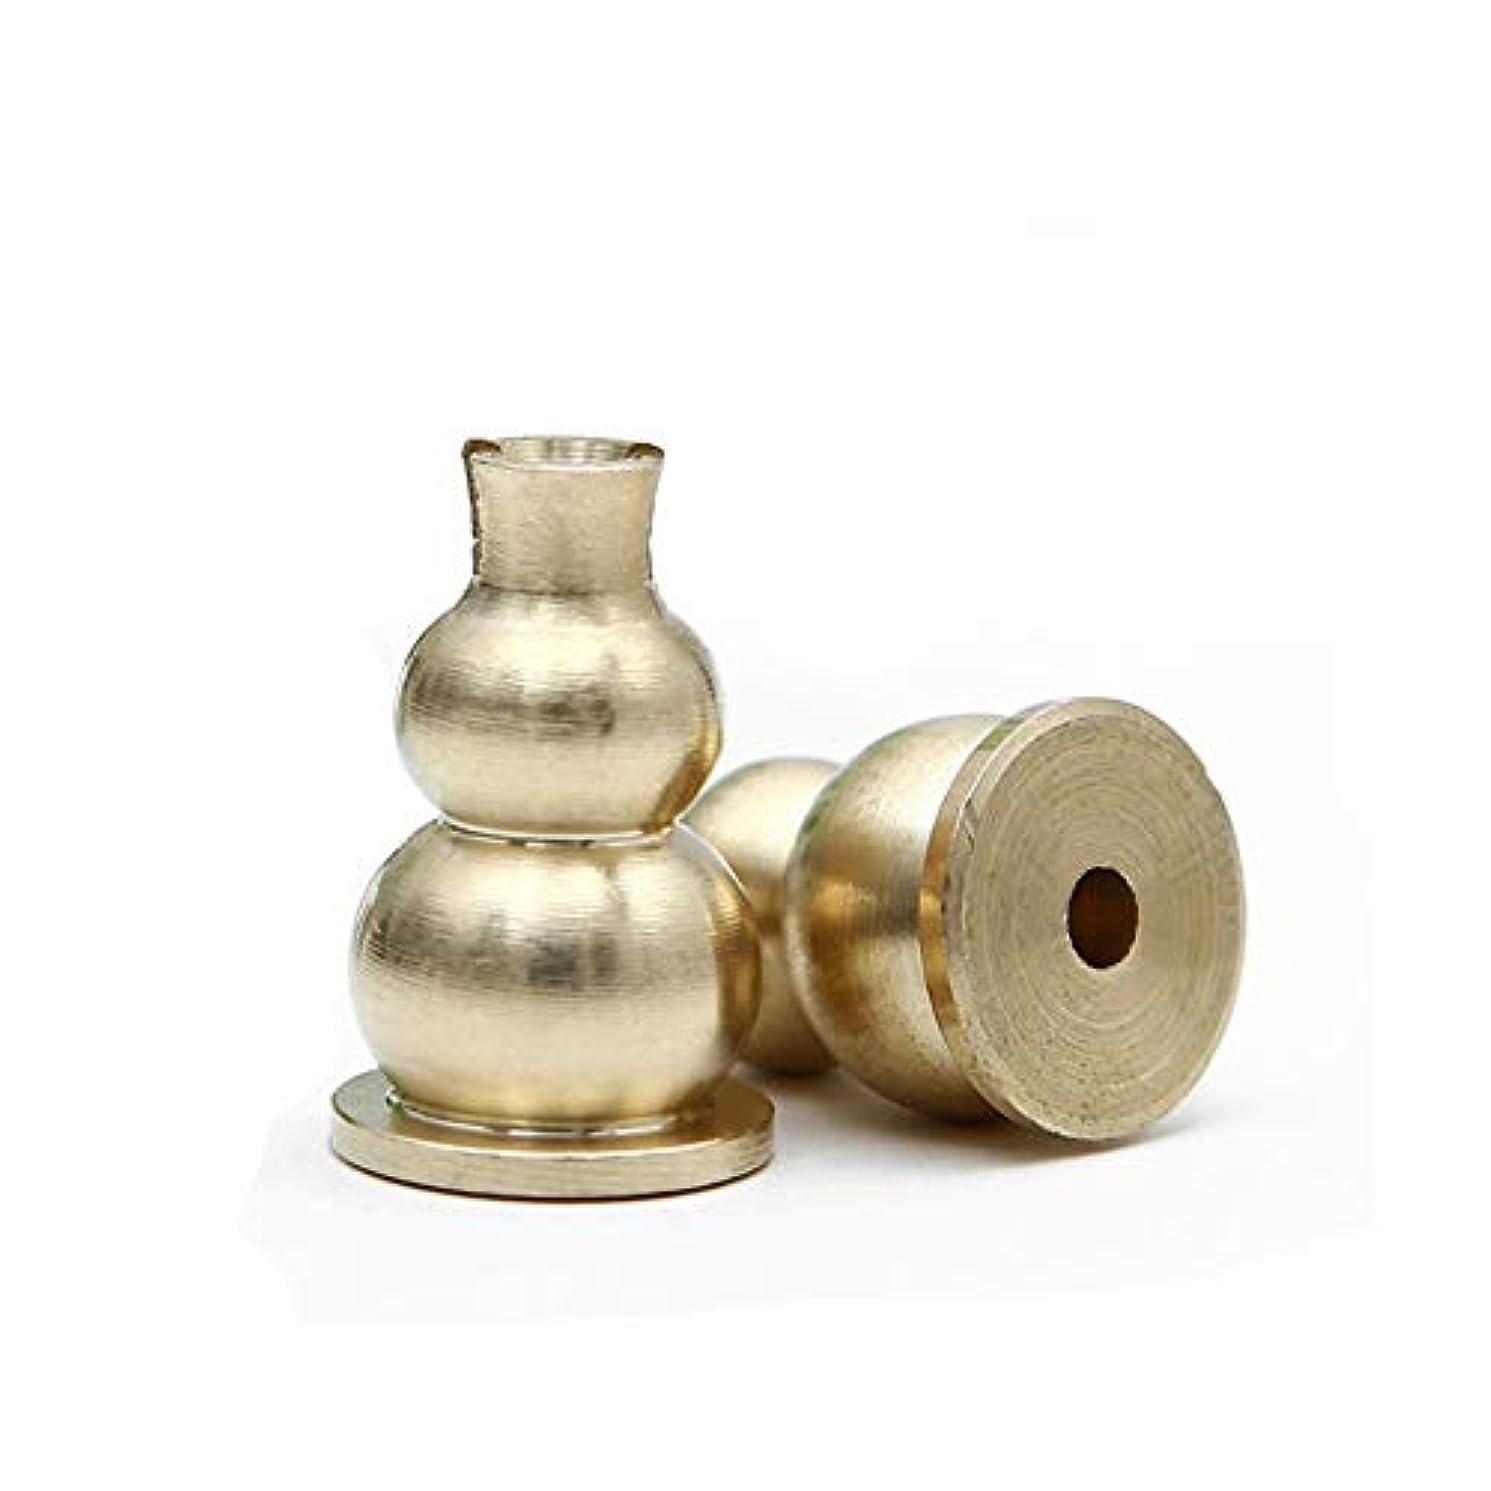 afzshg真鍮Mini Incense Holder and Sticksお香バーナーホルダーGourdシェイプイエロー